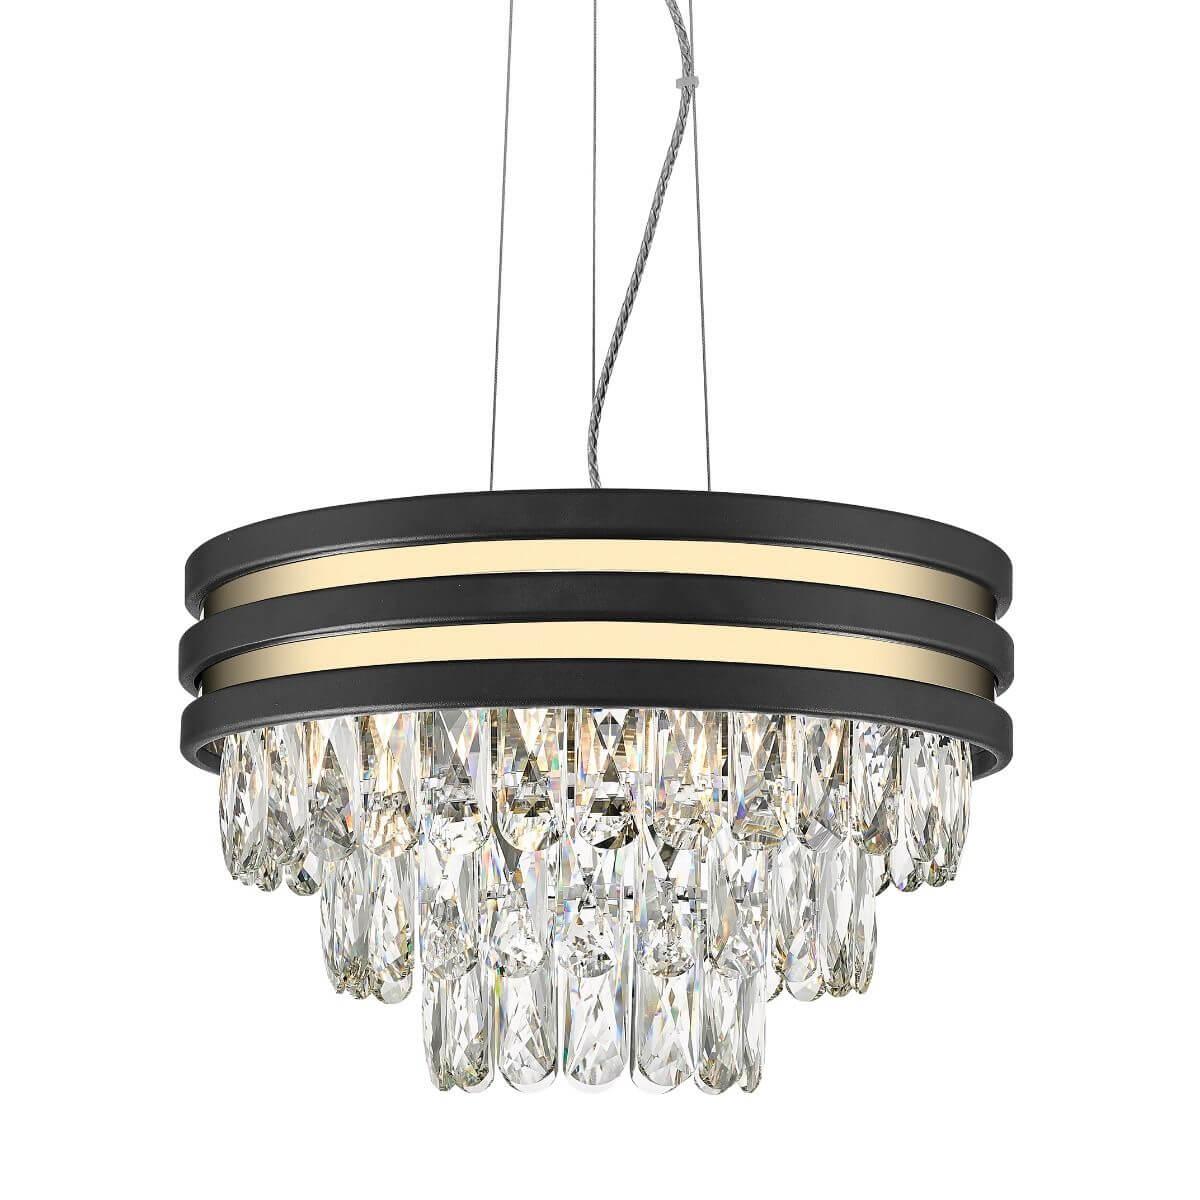 Висяща лампа Naica, черно и златно